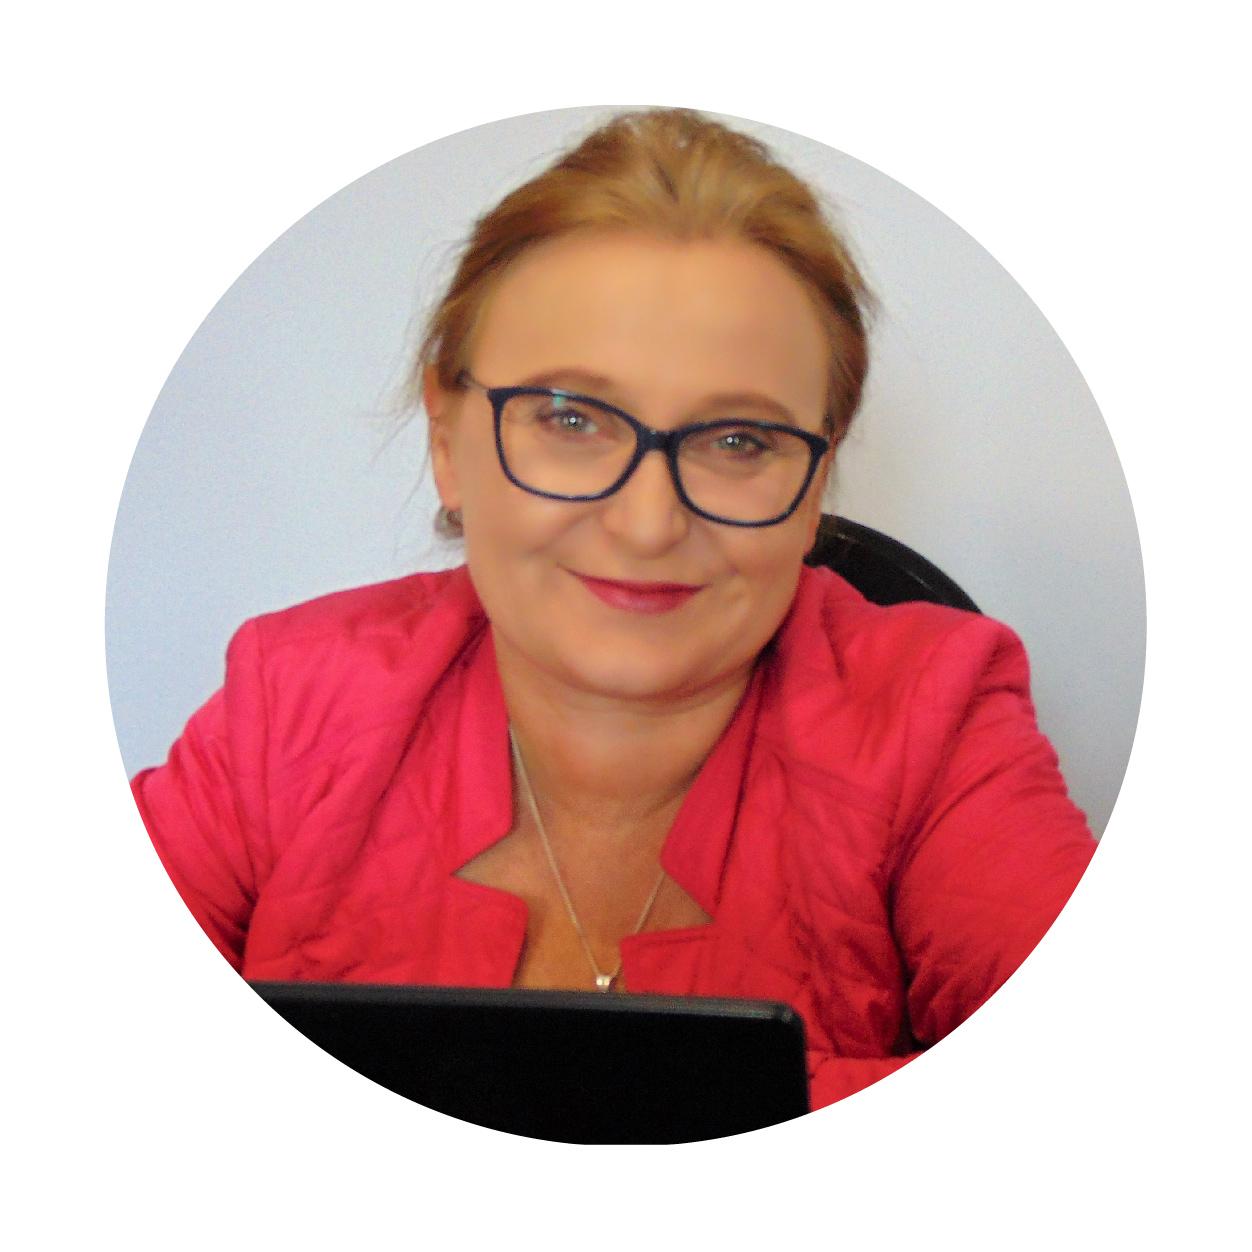 Pani wójt Jolanta Krysowata–Zielnica